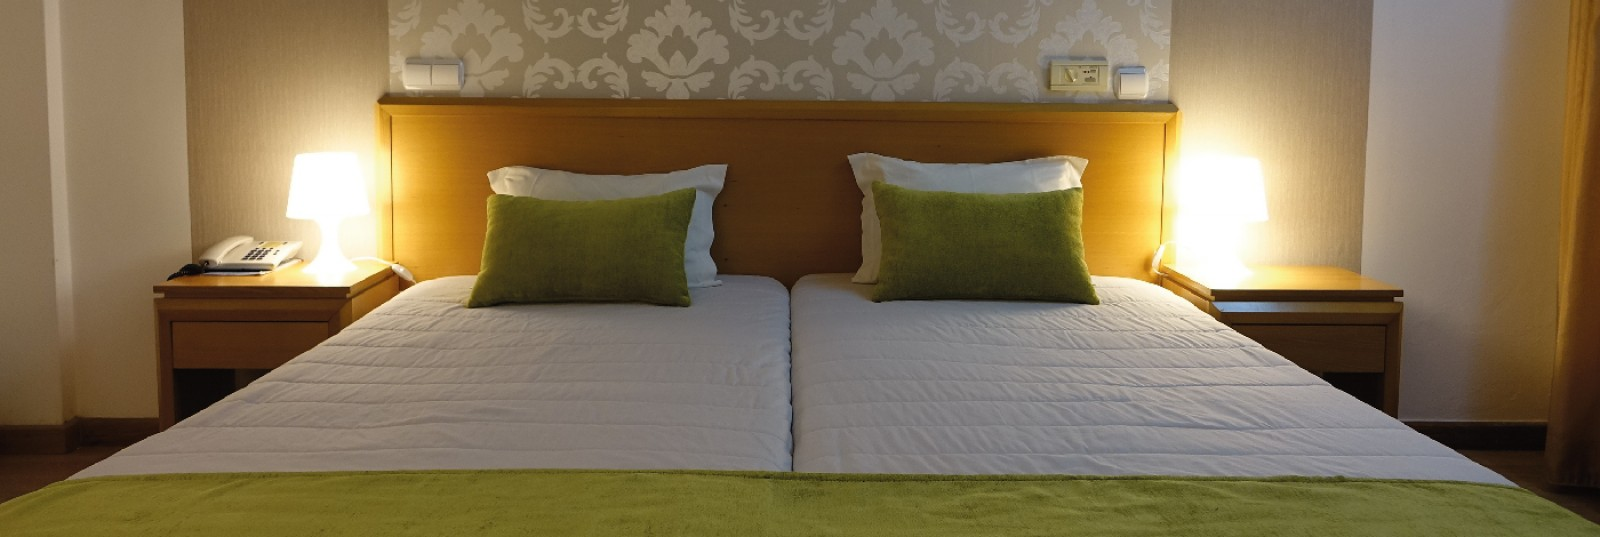 Hotel Eurosol Alcanena - doble